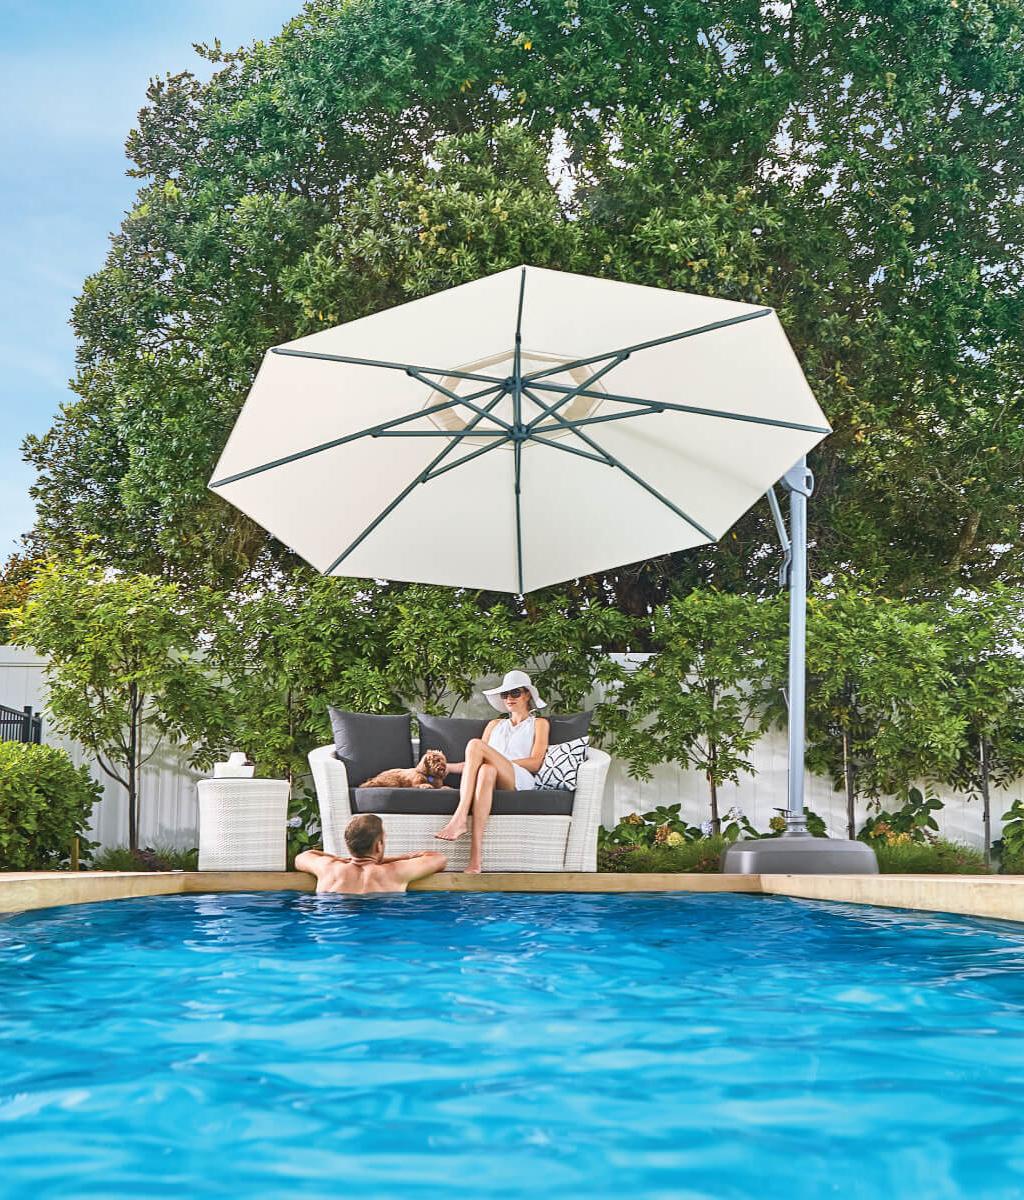 White Cantilever Umbrella for Auckland Pool